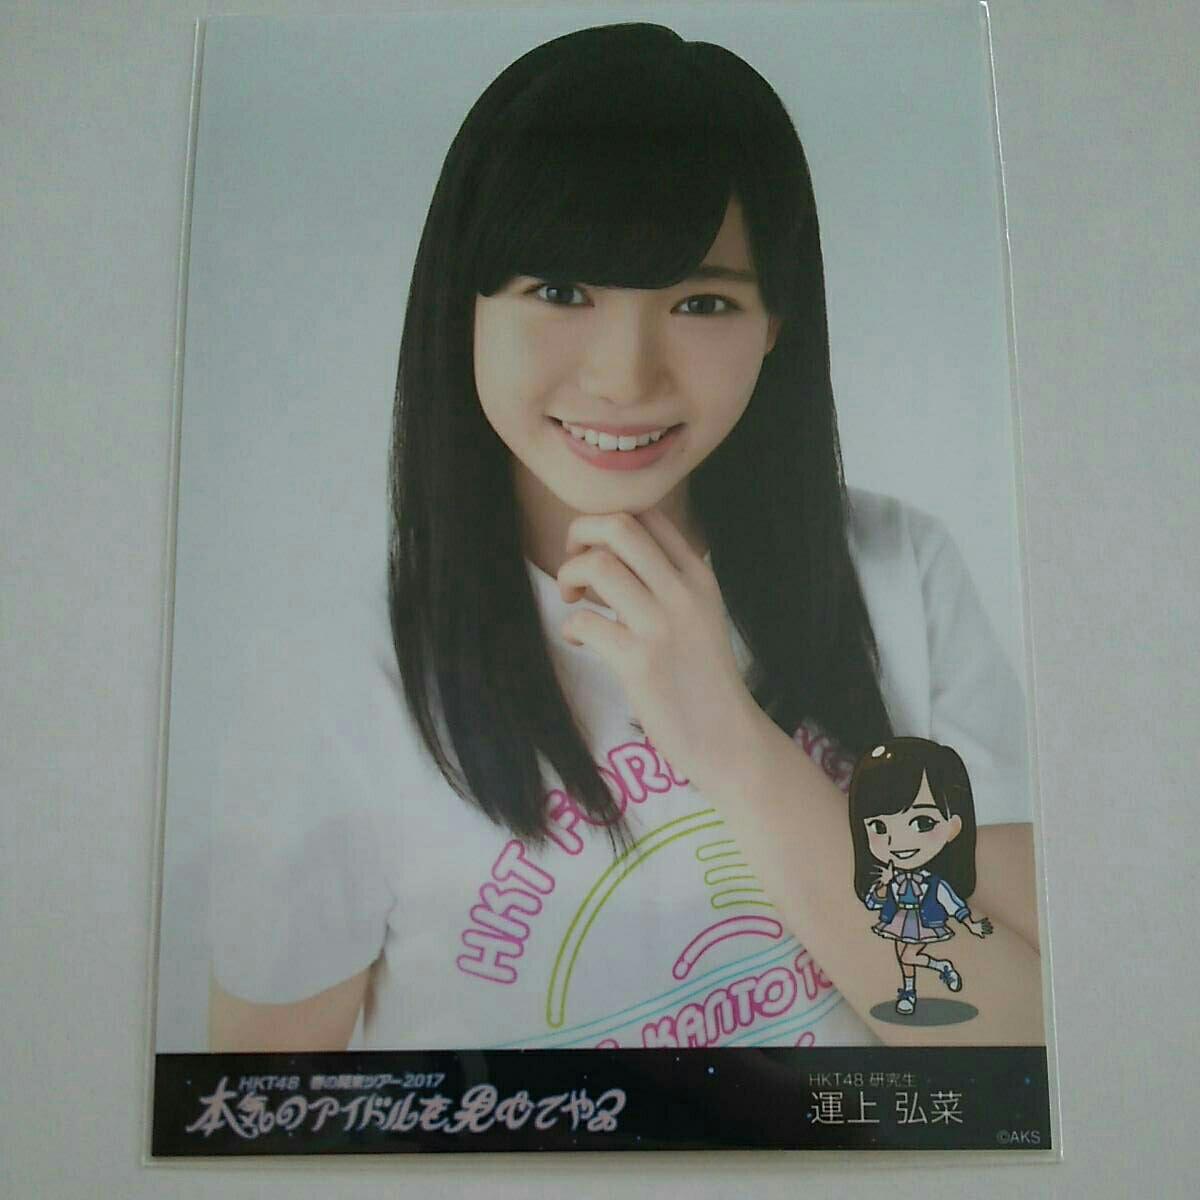 HKT48 運上弘菜 春の関東ツアー DVD/BD 封入 特典 生写真 ~本気のアイドルを見せてやる~ ライブグッズの画像